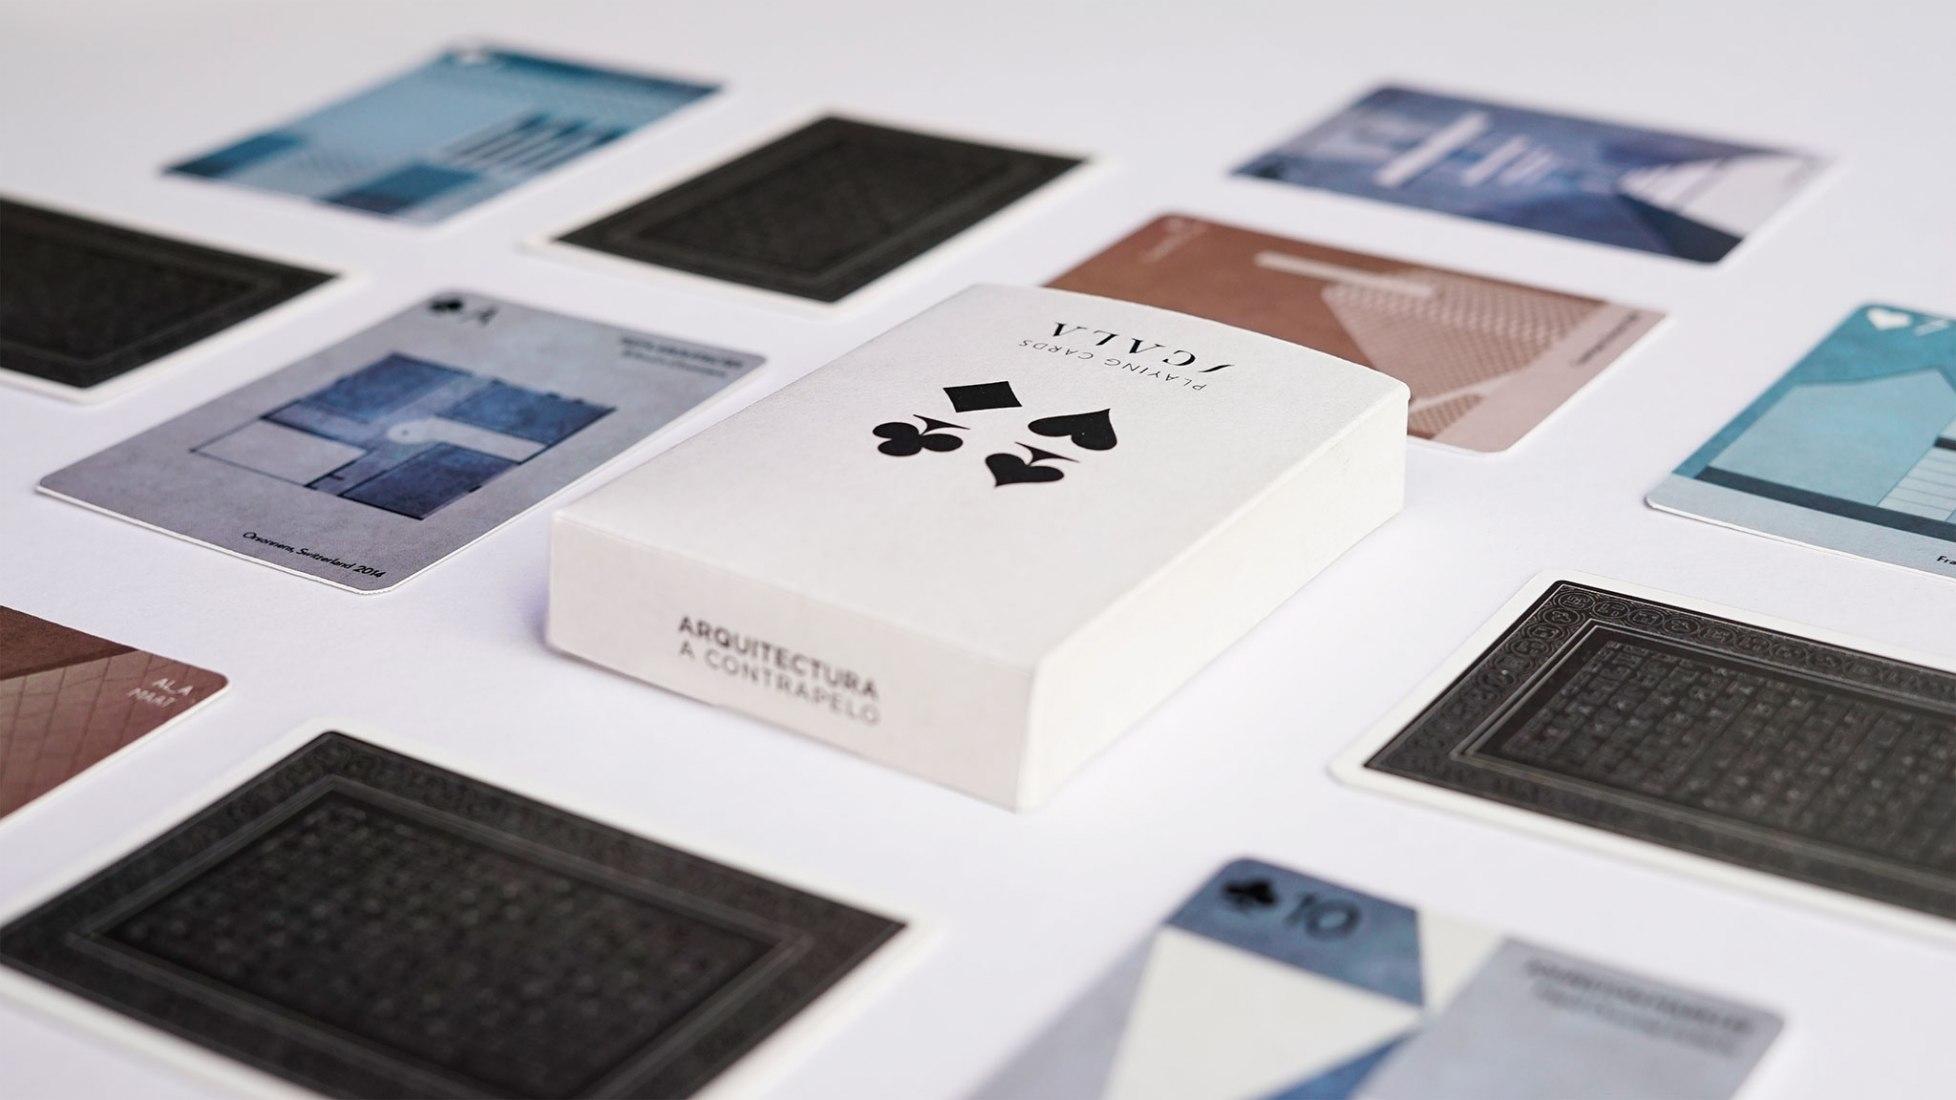 SCALA · Architecture Playing Cards por Arquitectura a contrapelo.